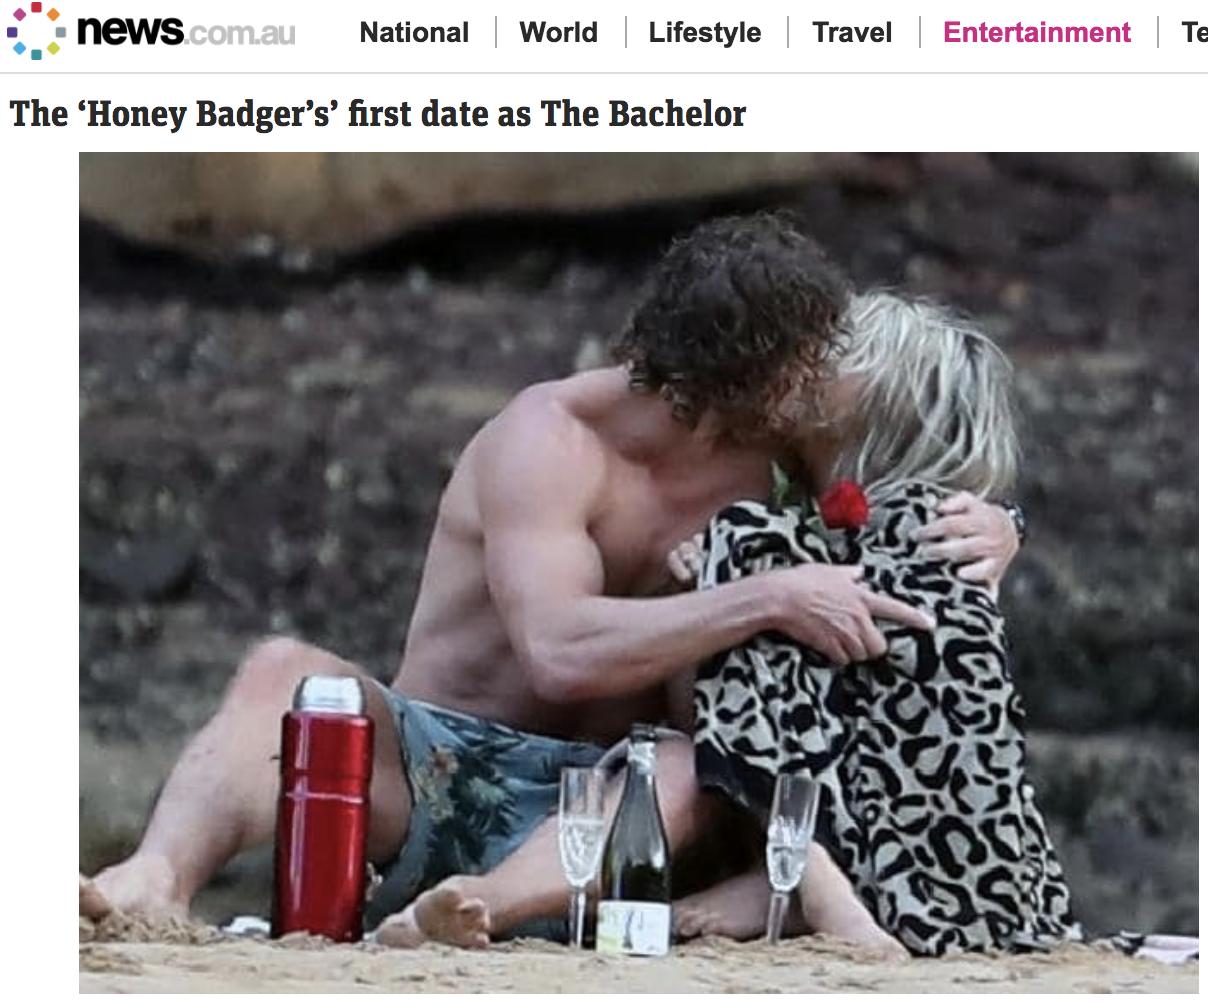 The Bachelor paparrazi photo (news.com.au) [3]